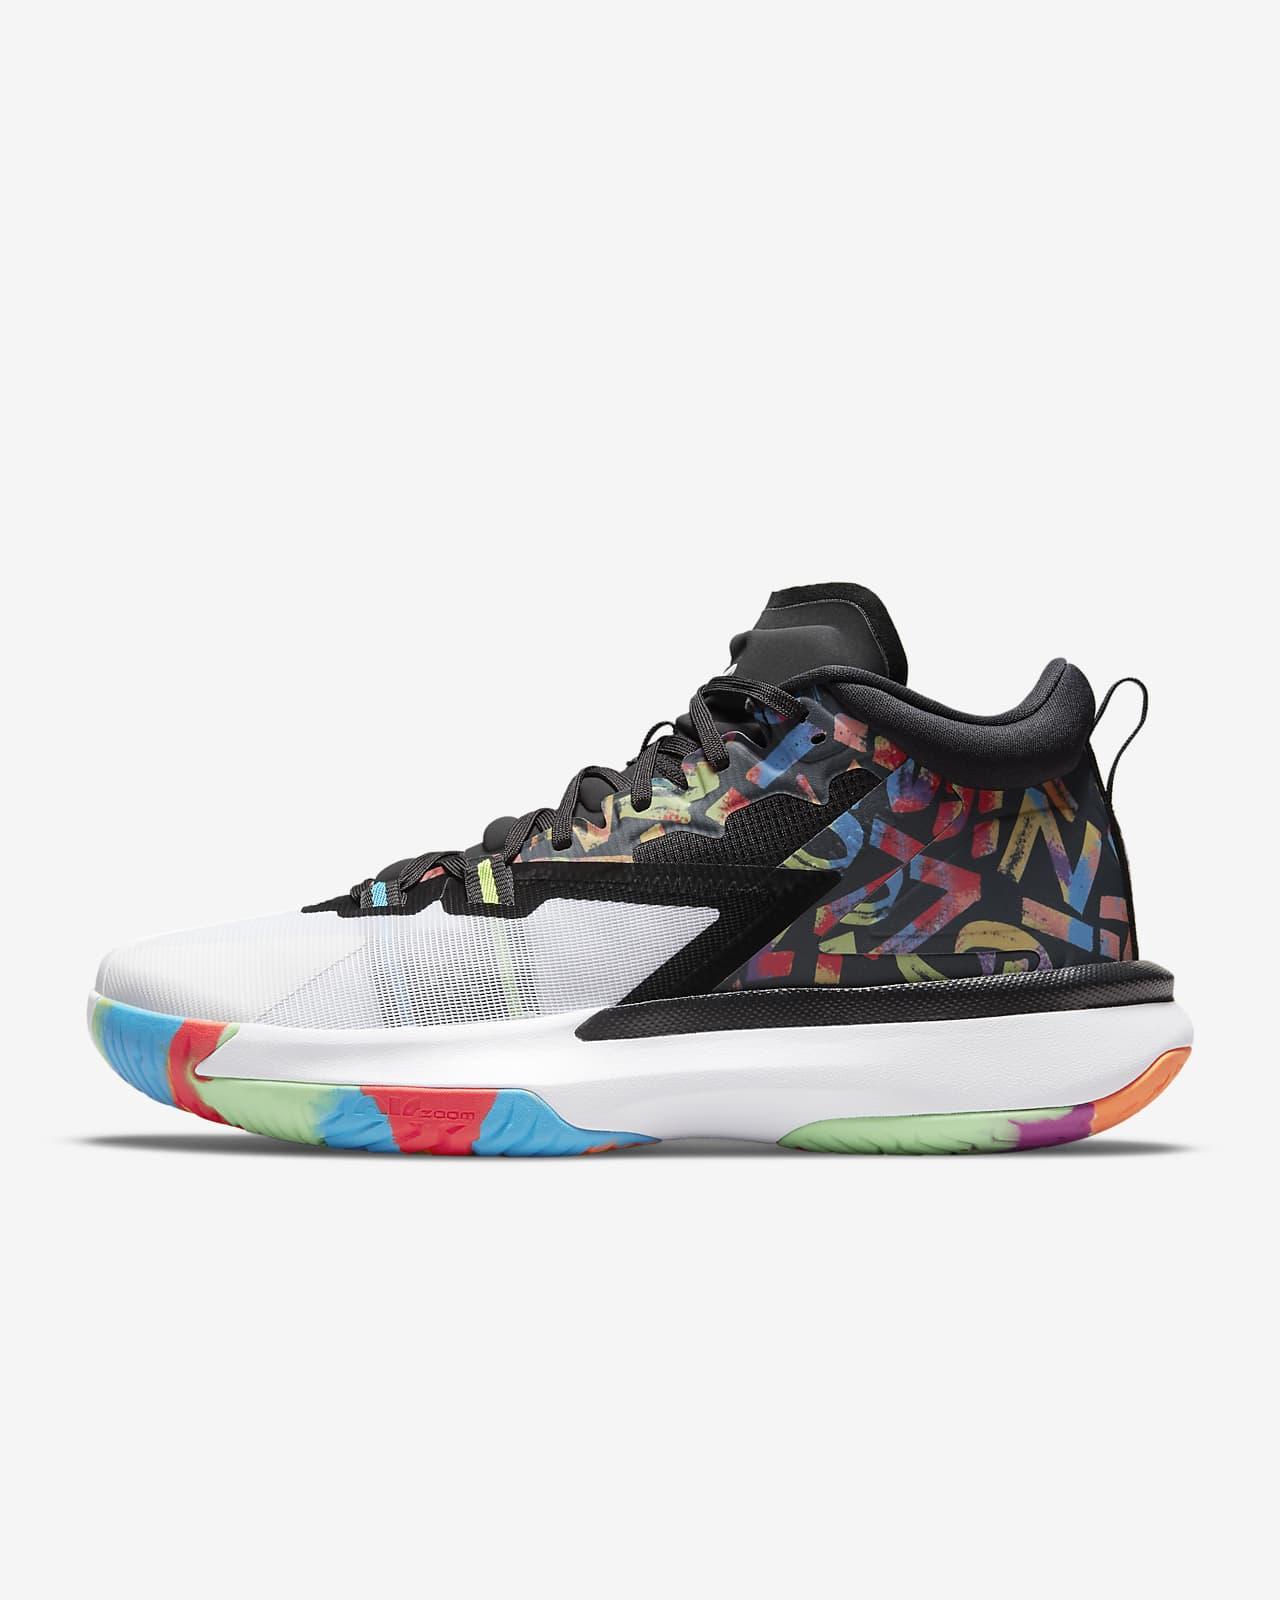 Zion 1 'Noah' Basketball Shoes